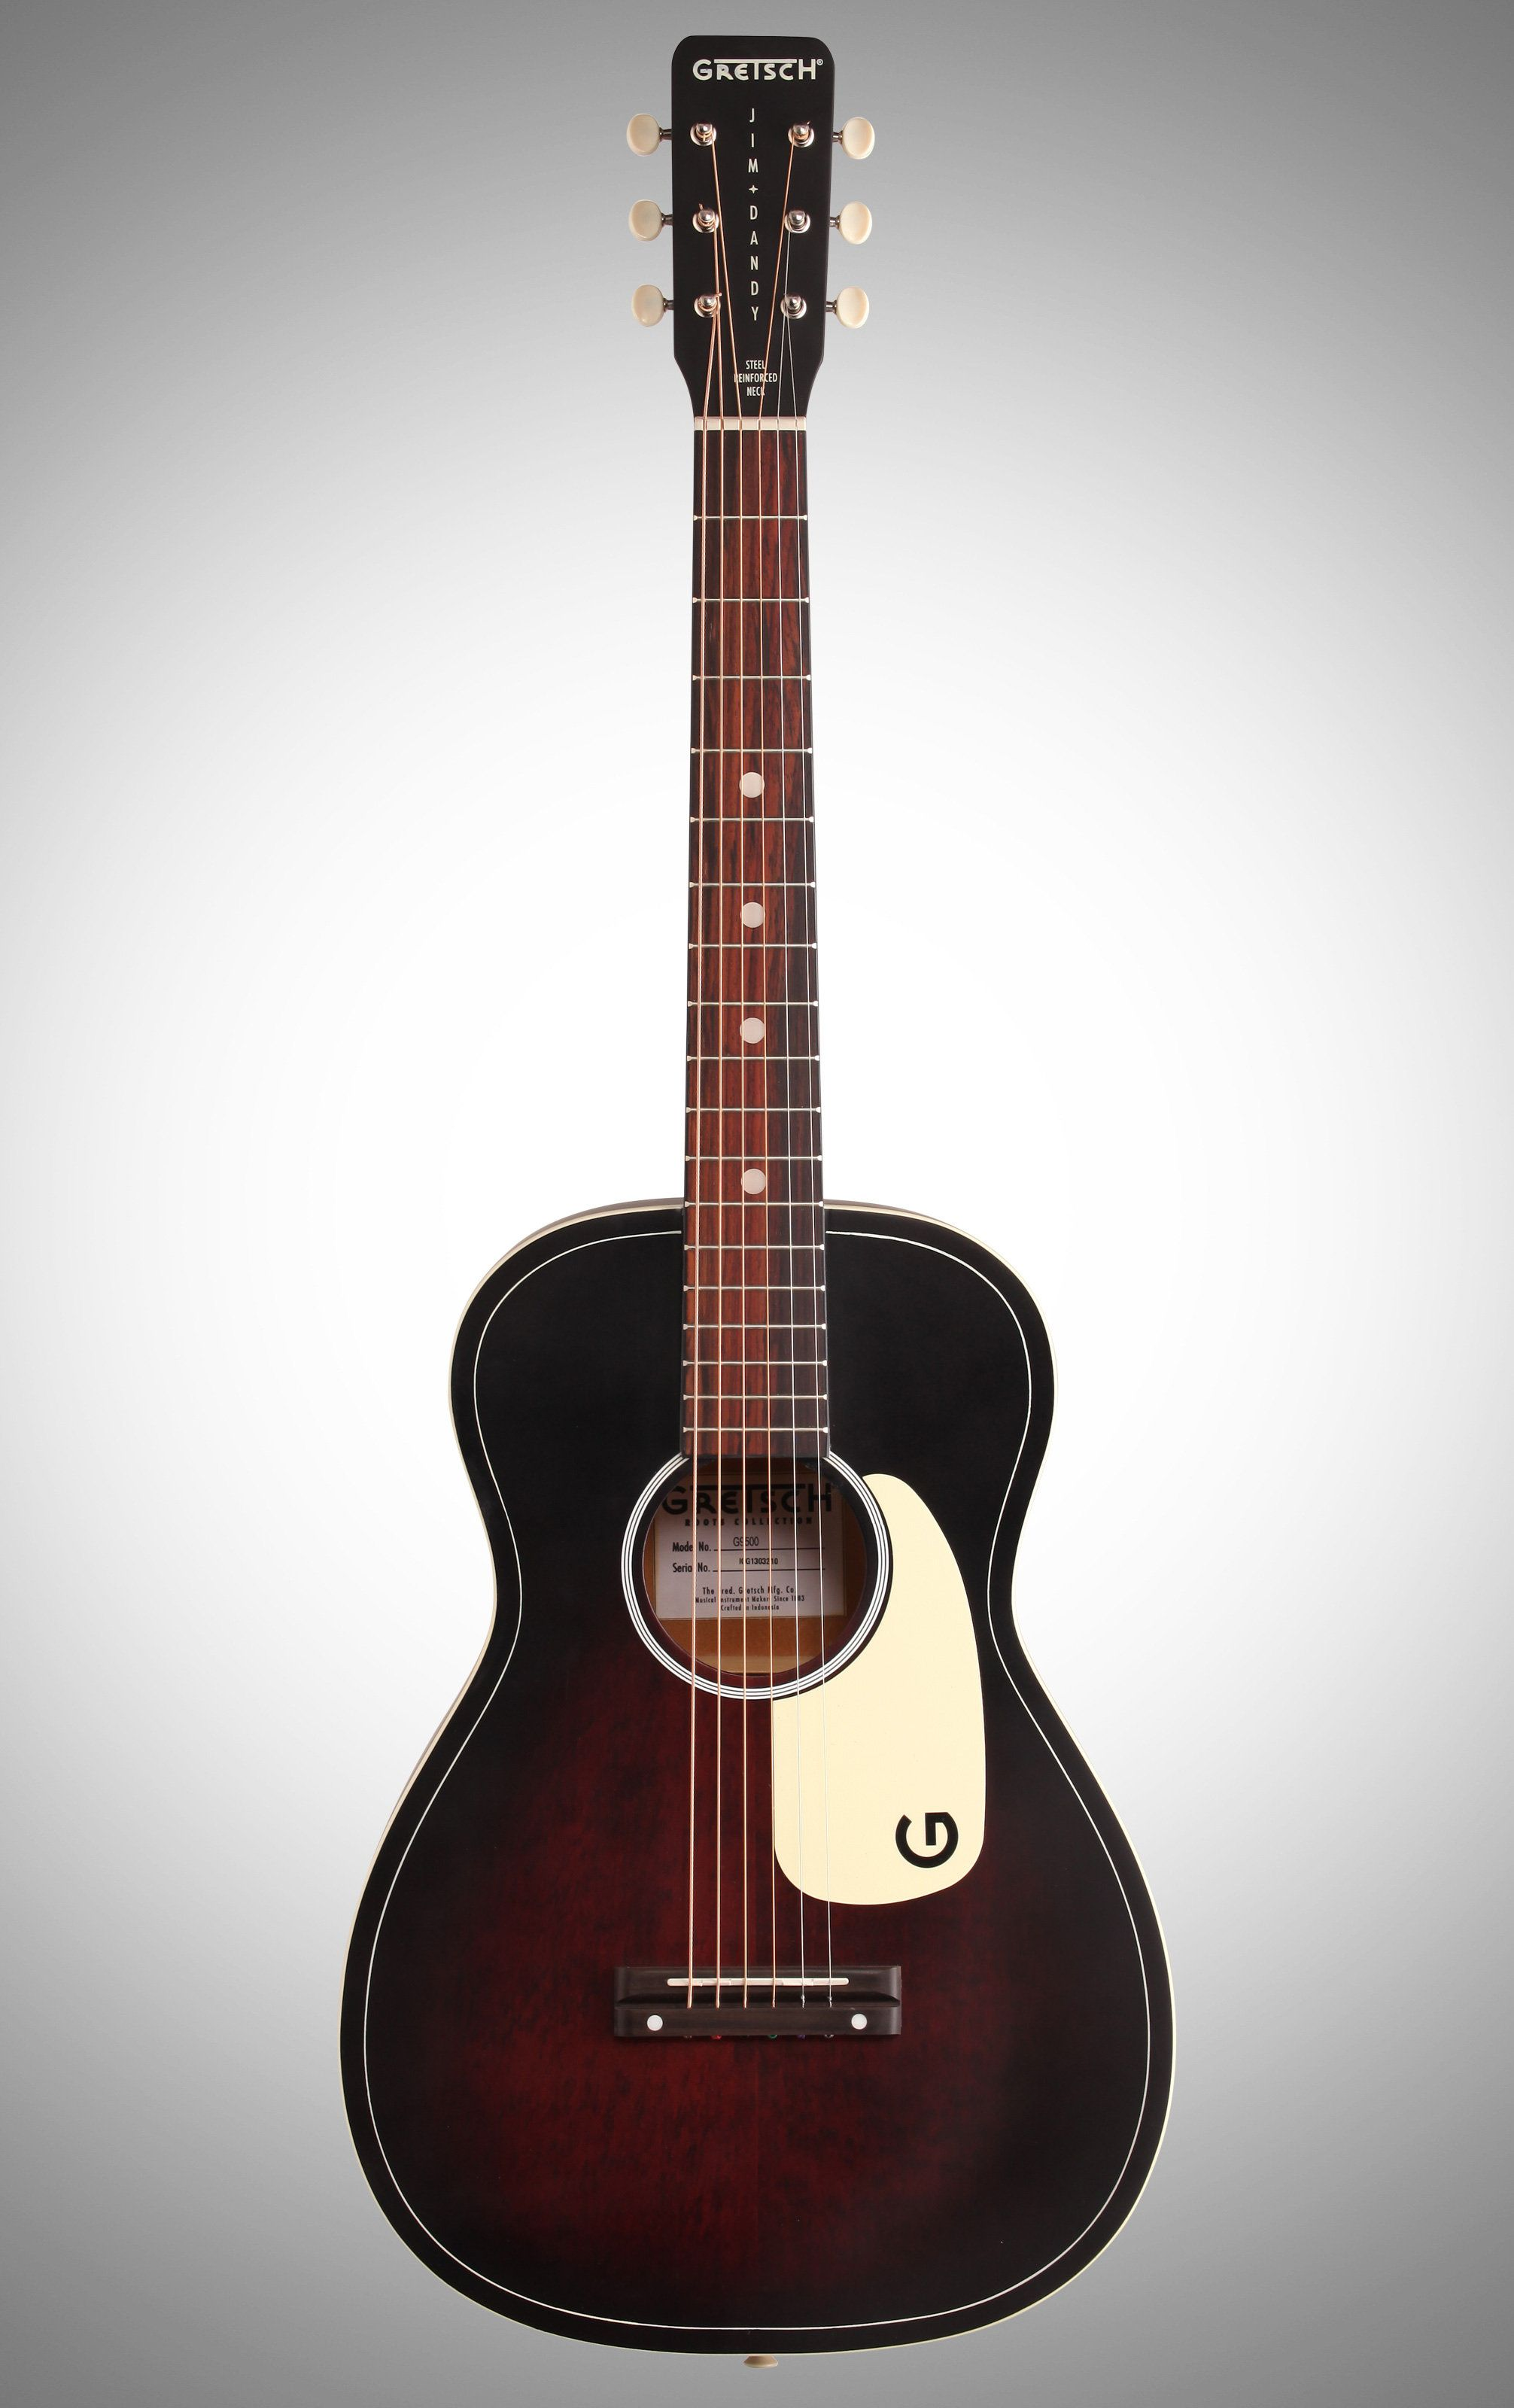 Gretsch G9500 Jim Dandy Parlor Flat Top Yamaha Guitar Acoustic Guitar Guitar